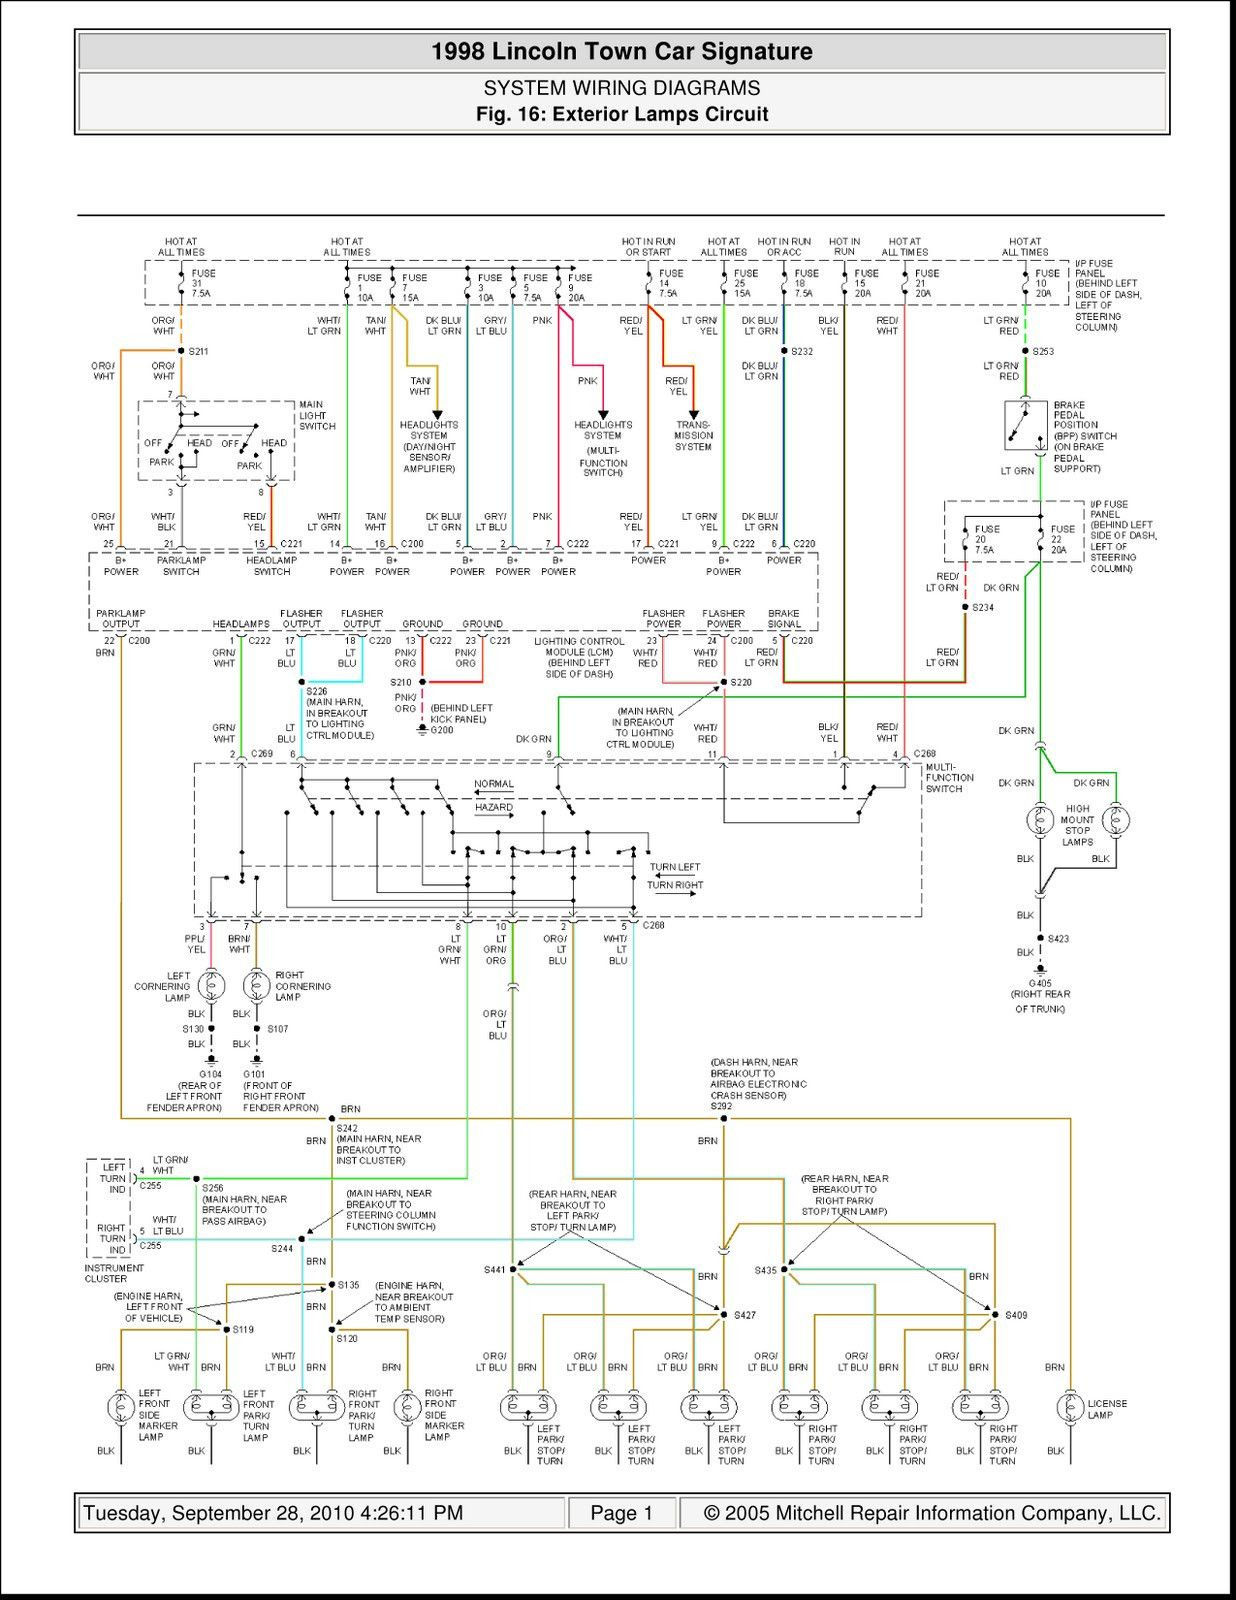 23 Best Sample Of Automotive Wiring Diagram Design ,  https://bacamajalah.com/23-best-sample-of-automotive-wiring-diag… |  Electrical diagram, Diagram, Diagram design